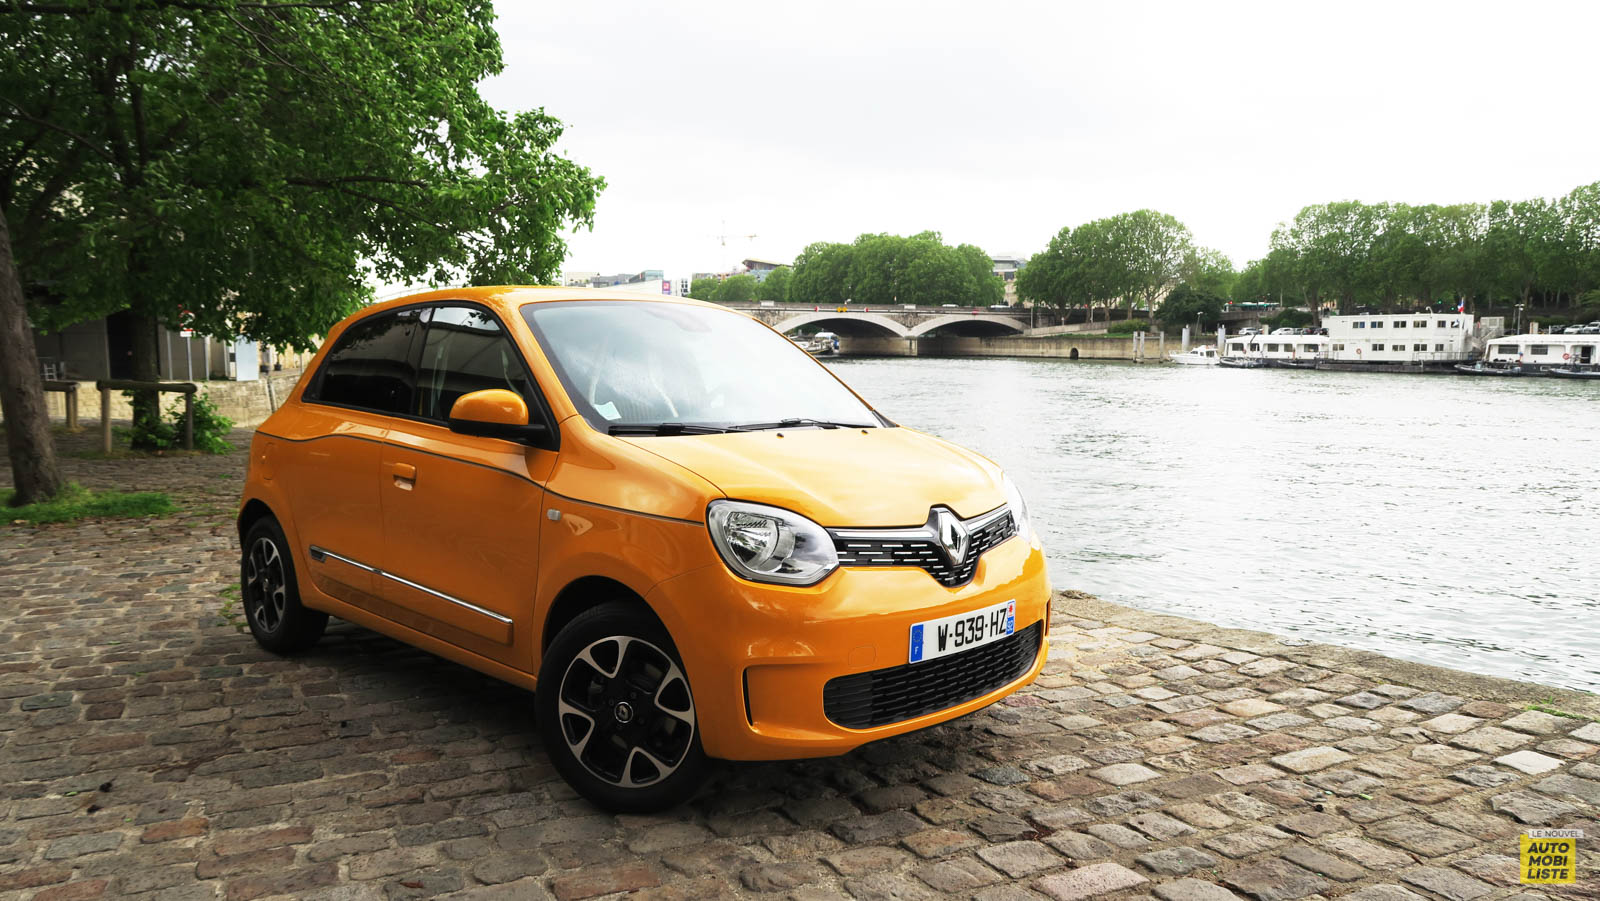 LNA Essai 2019 Renault Twingo 3.2 1.0 SCe Intens 11